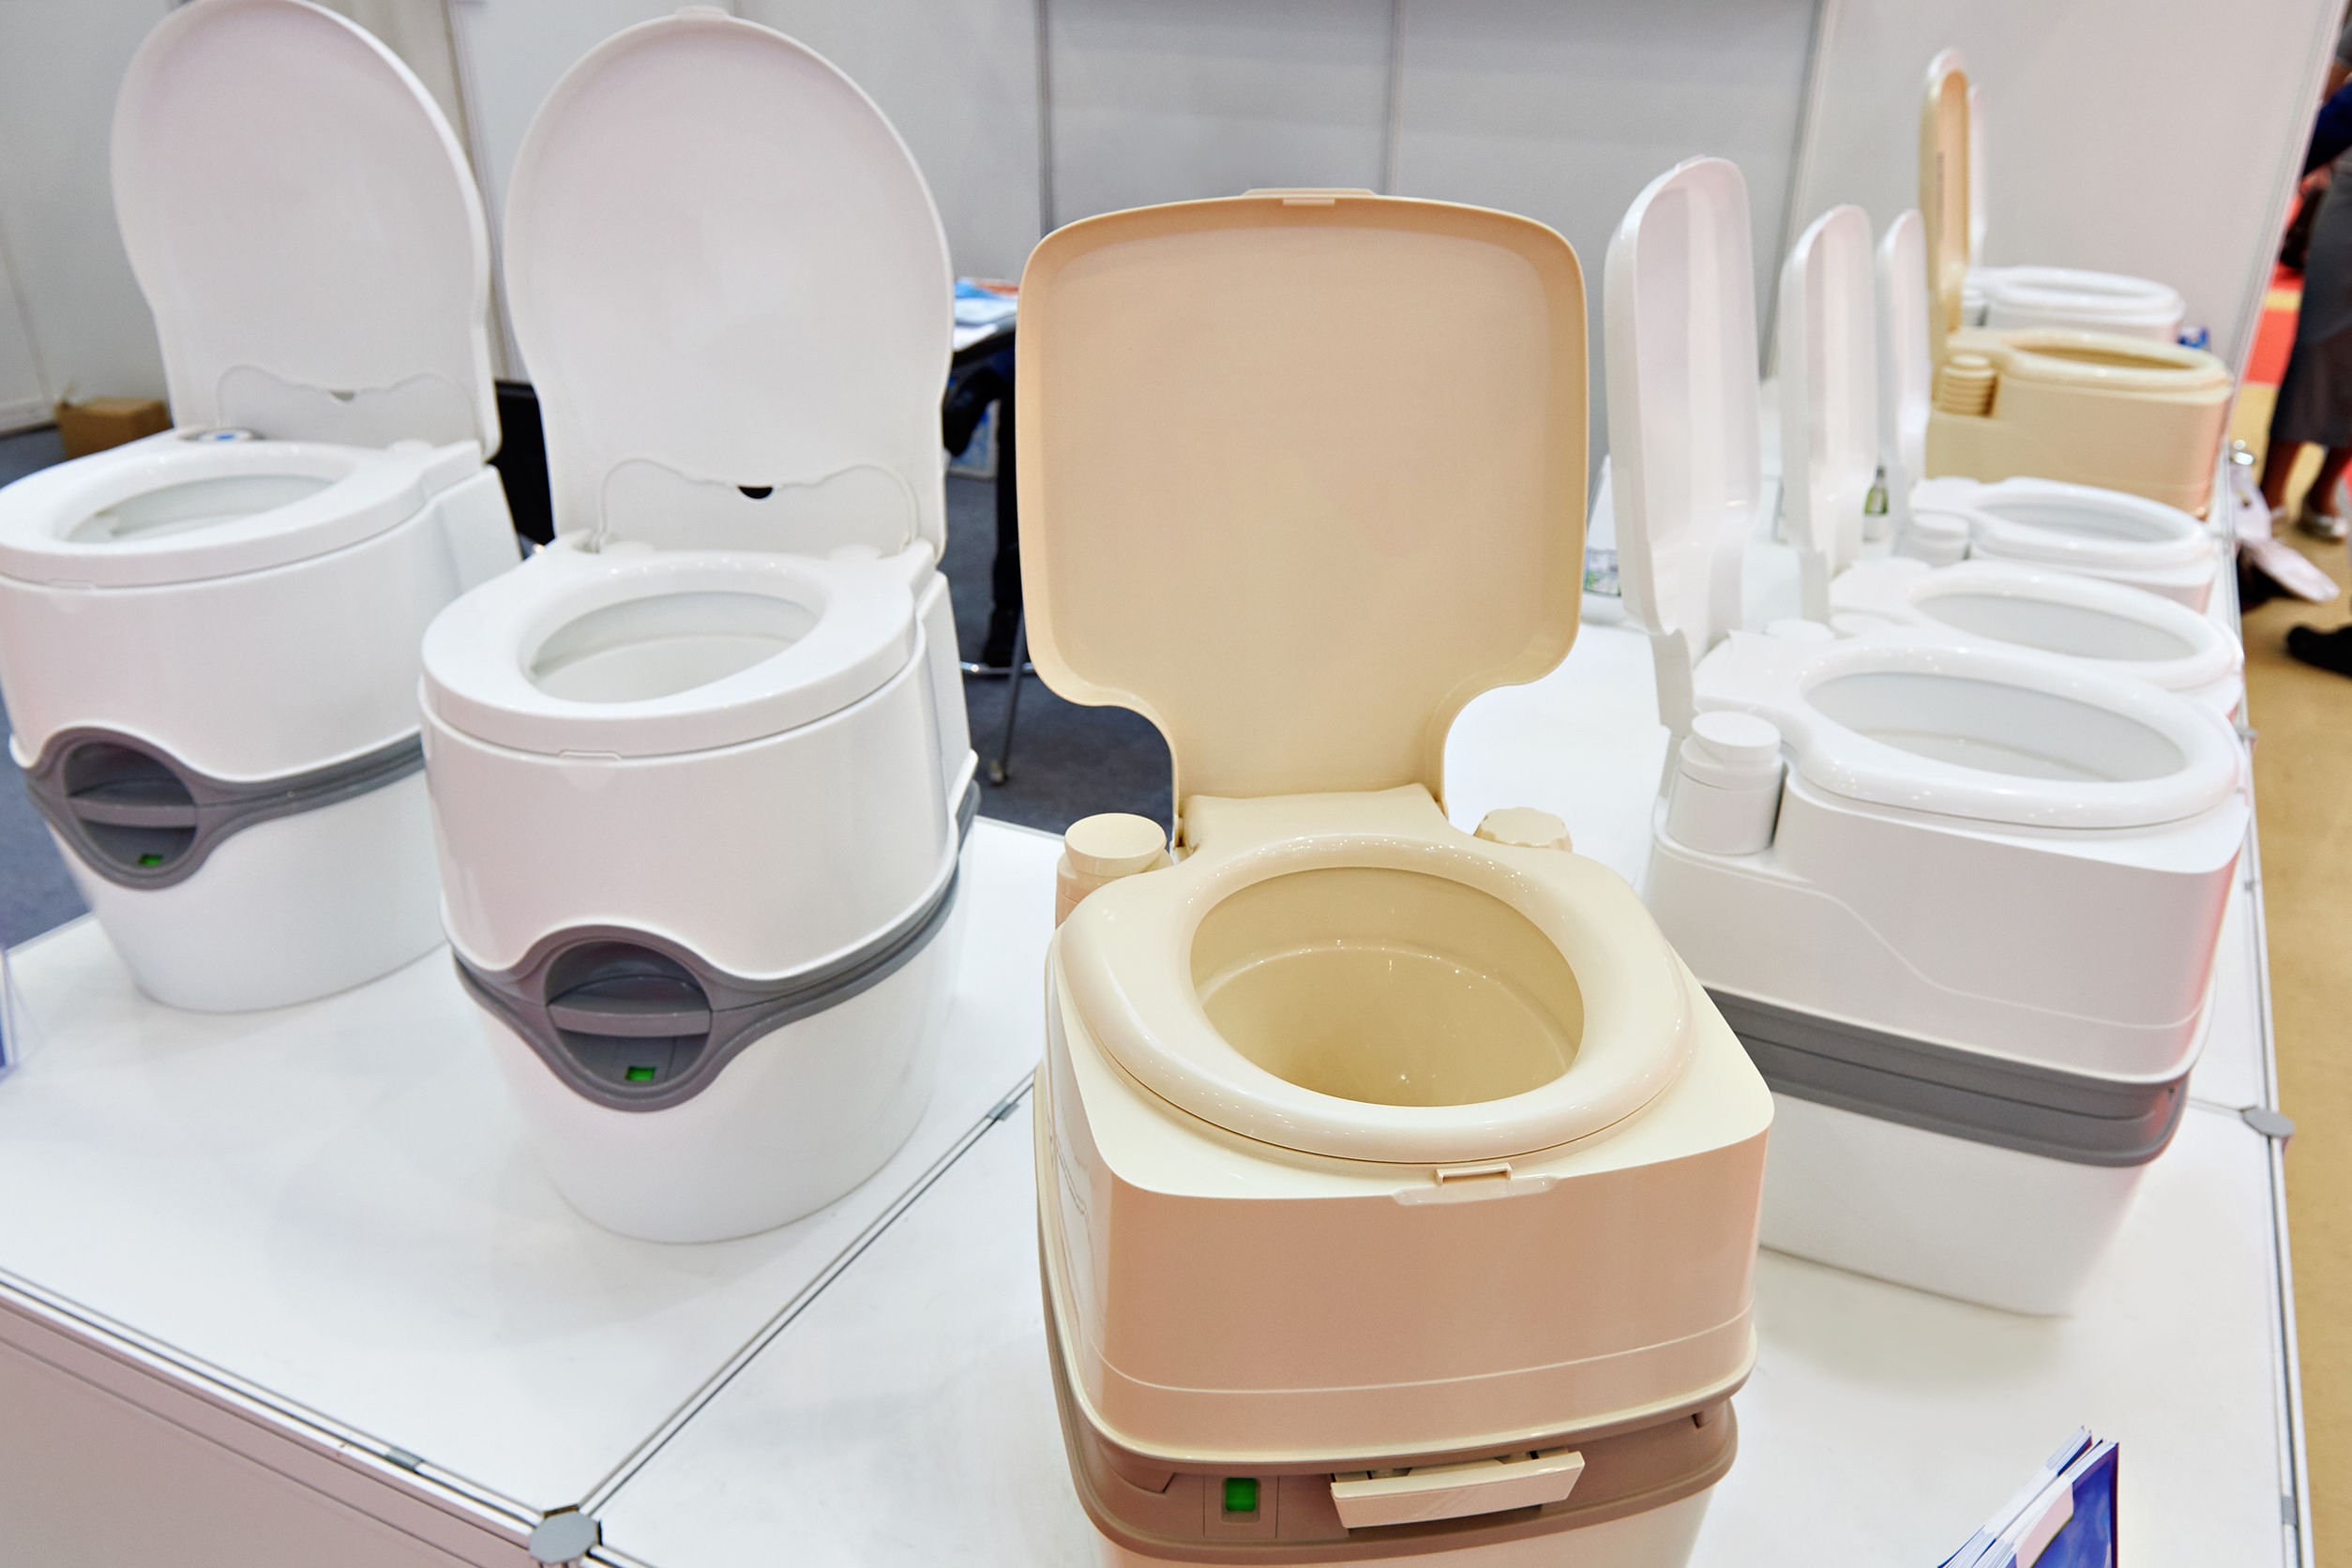 WC portátil: ¿Cuál es el mejor del 2021?